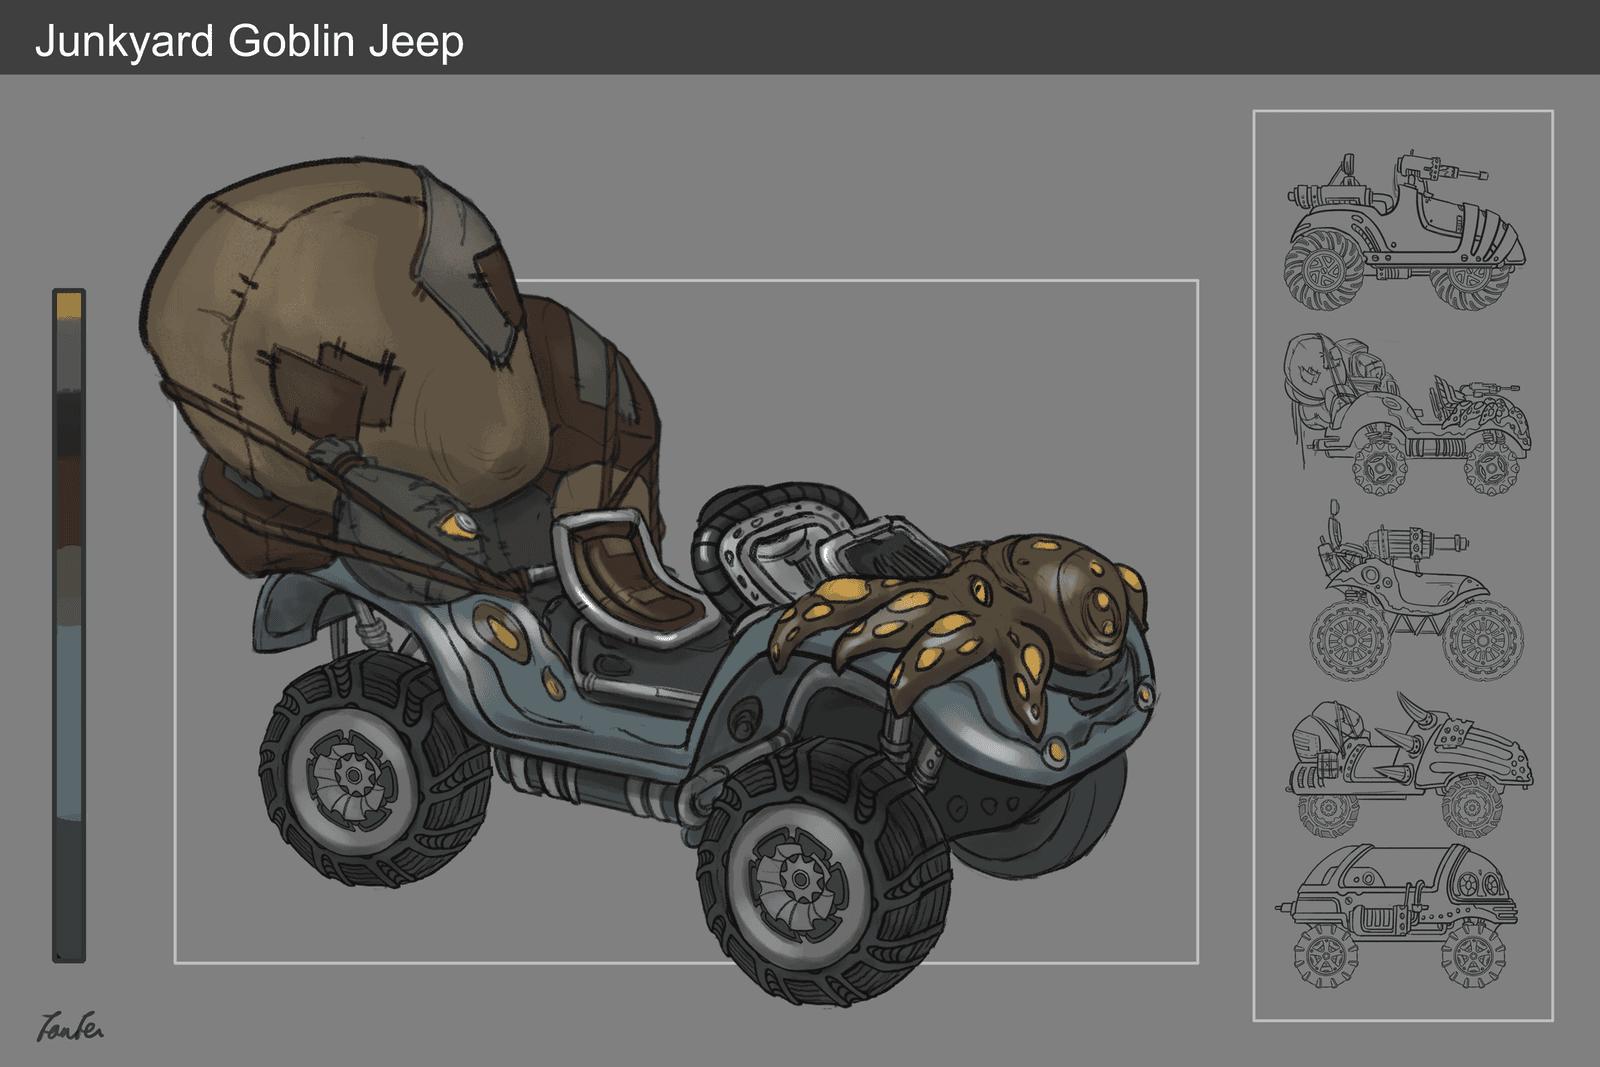 Junkyard Goblin Jeep